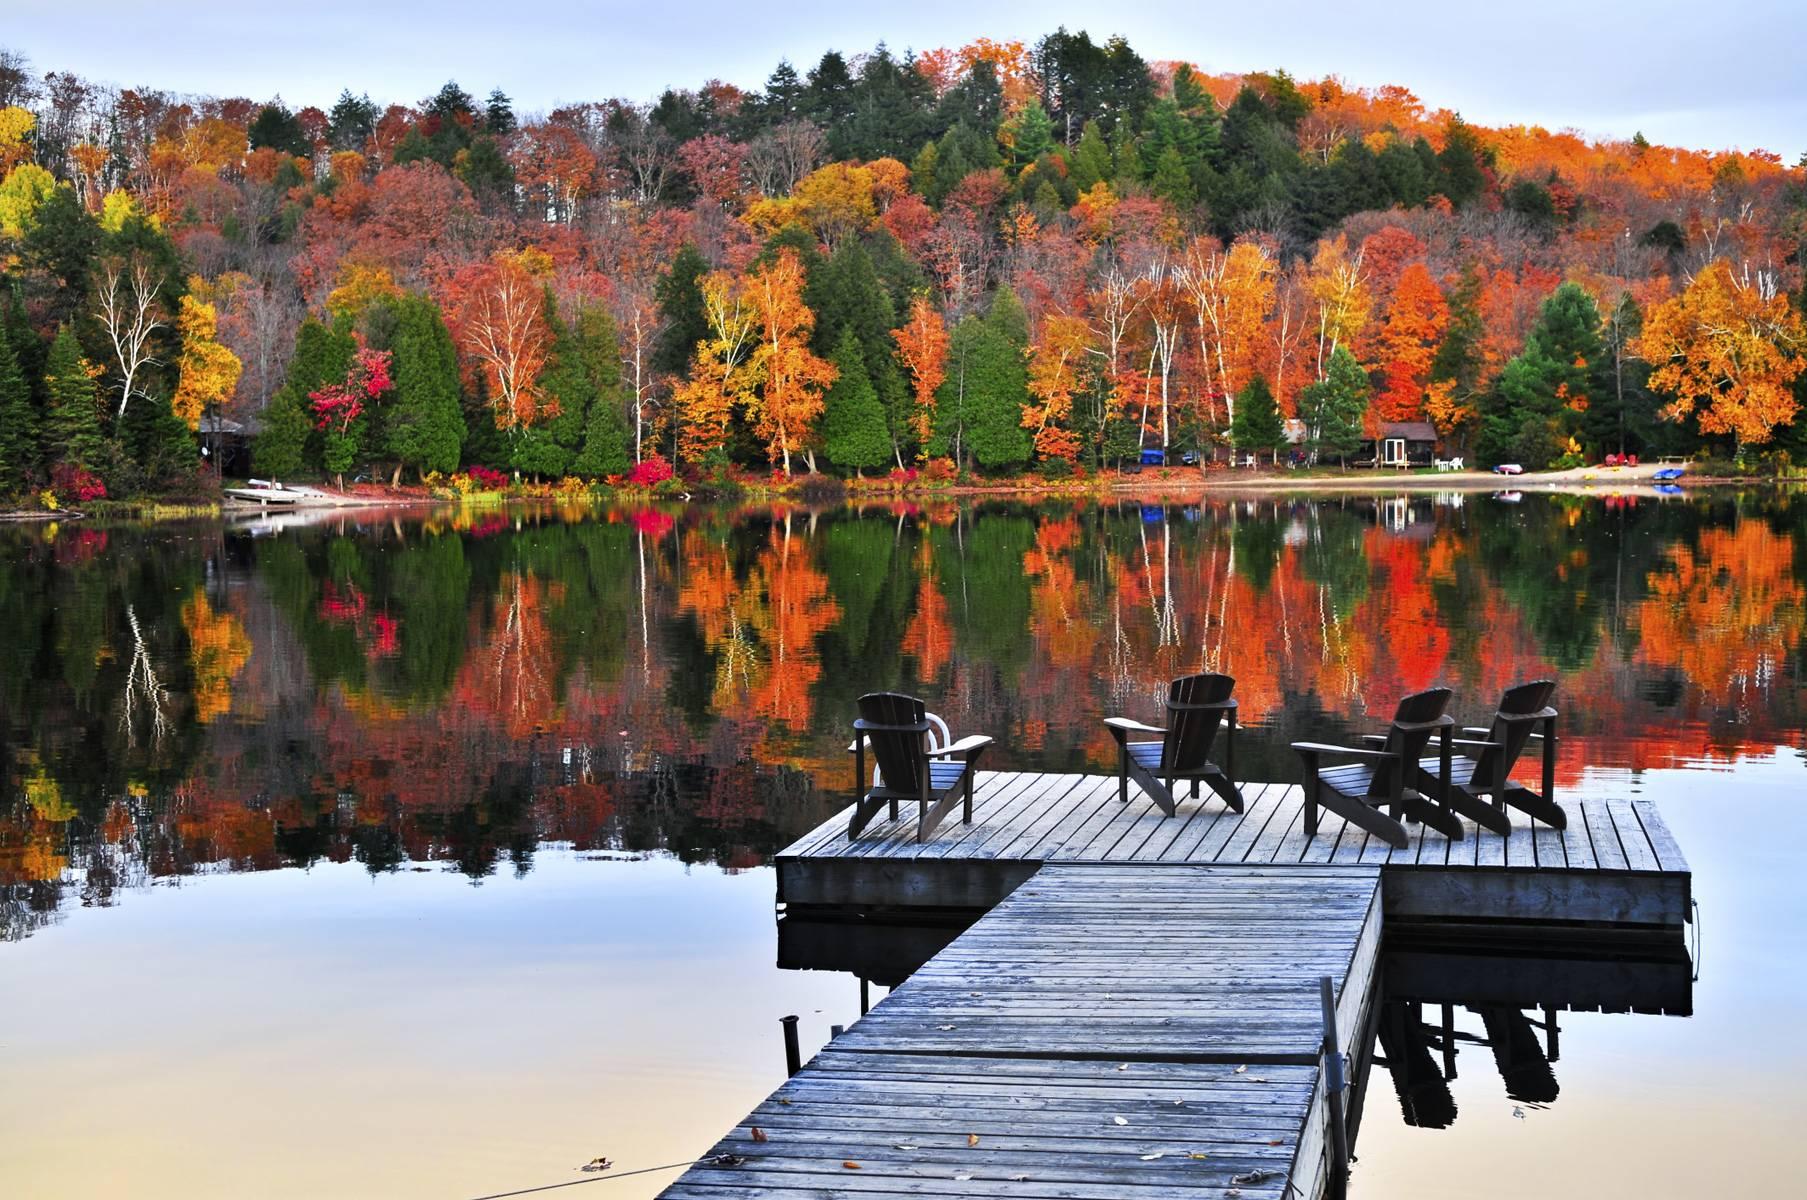 8-Day Canada East In-depth Fall Foliage Tour: Algonquin Provincial Park, Canyon Sainte, Thousand Islands